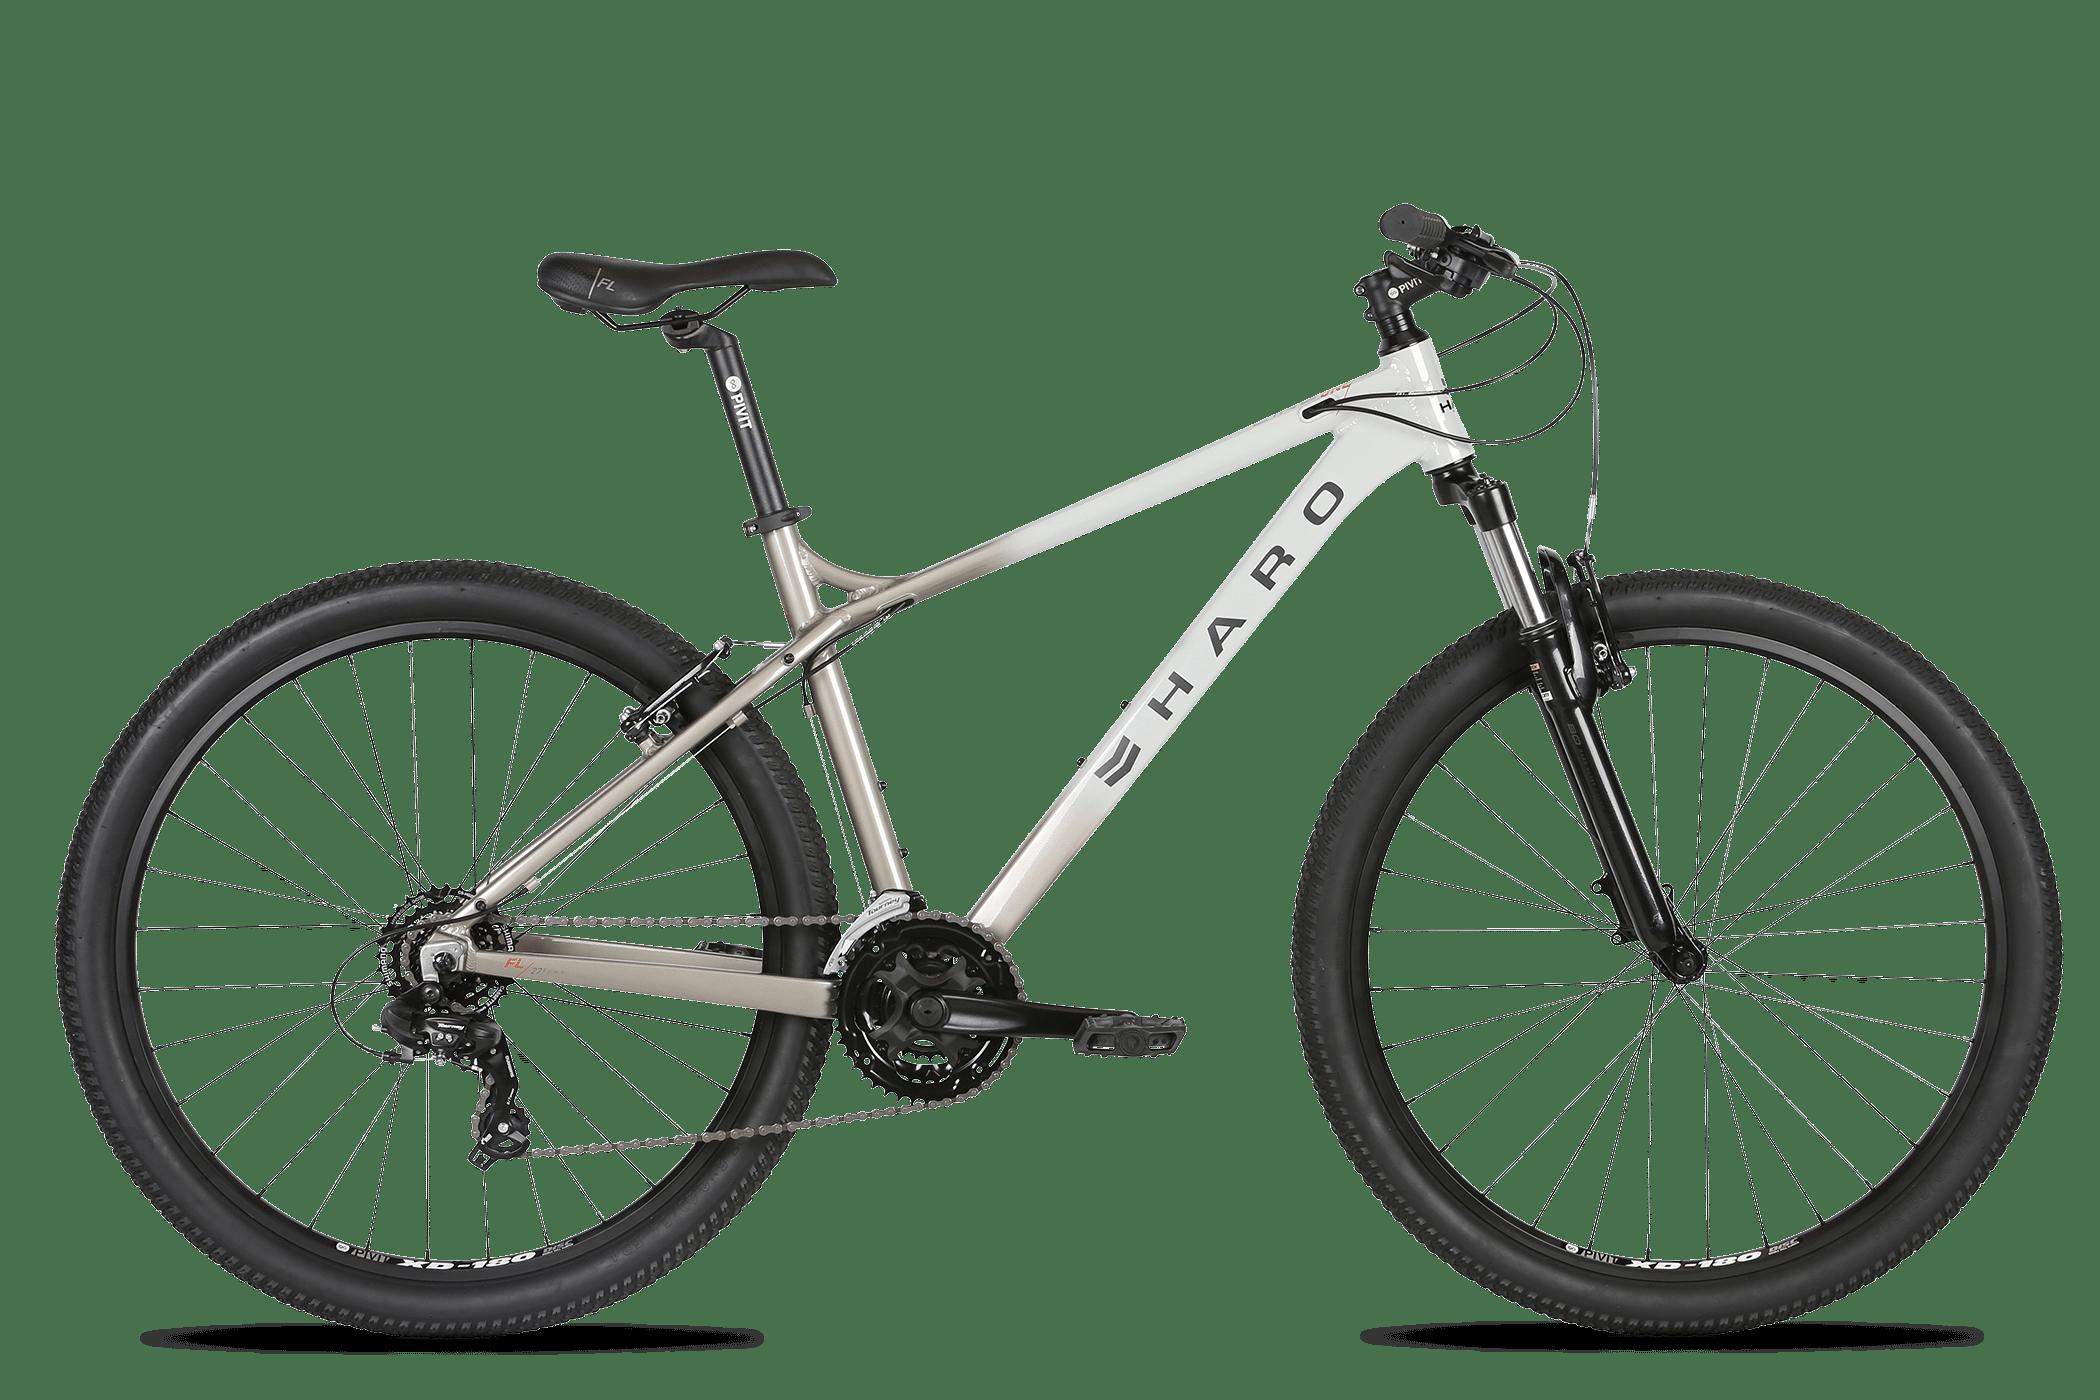 2021-Haro-MTB-FL-One-275-Grey-Fade_5000x – Copy